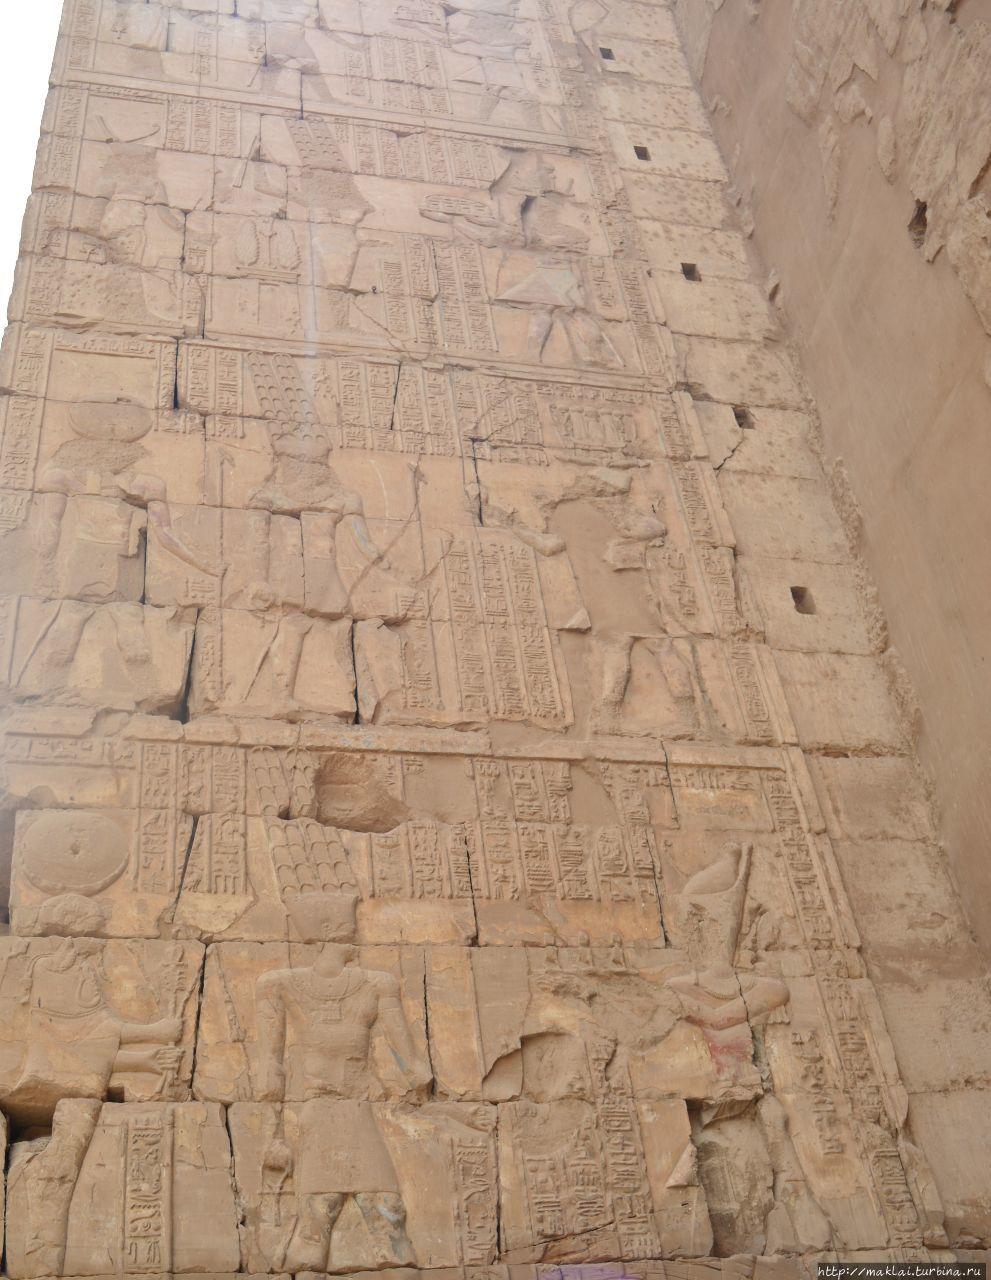 Начнём во здравие! Луксор. Город живых Луксор, Египет